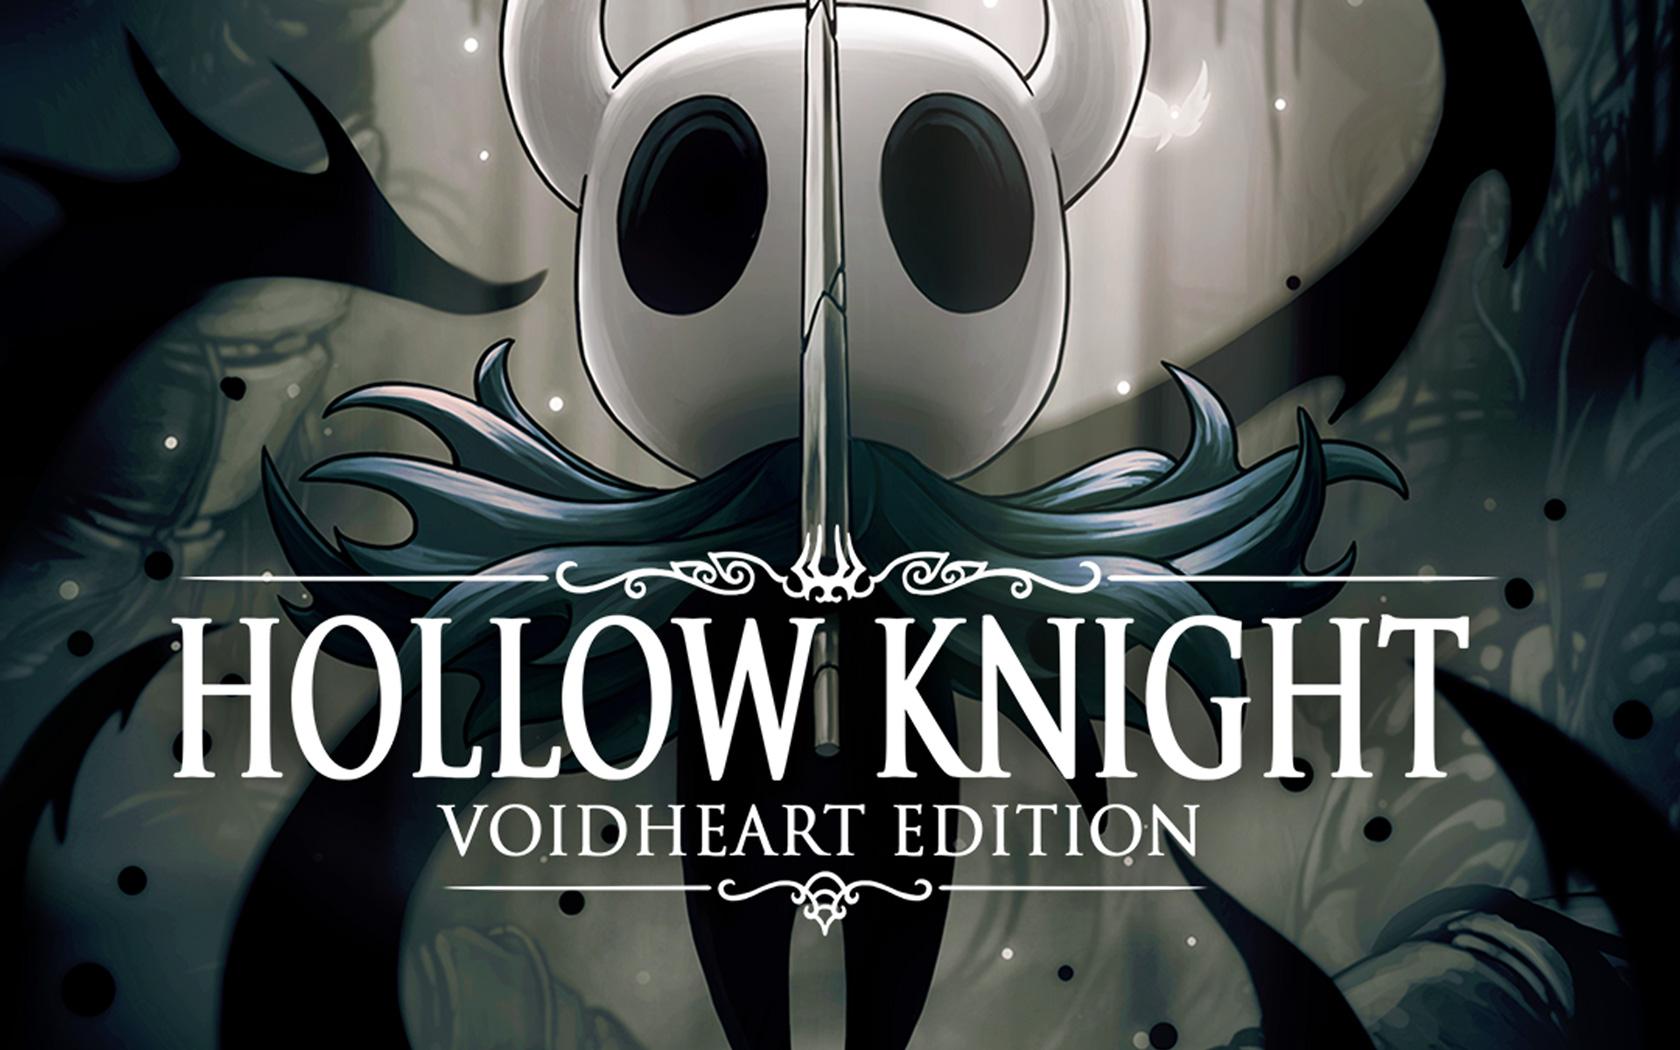 Hollow Knight Wallpaper in 1680x1050